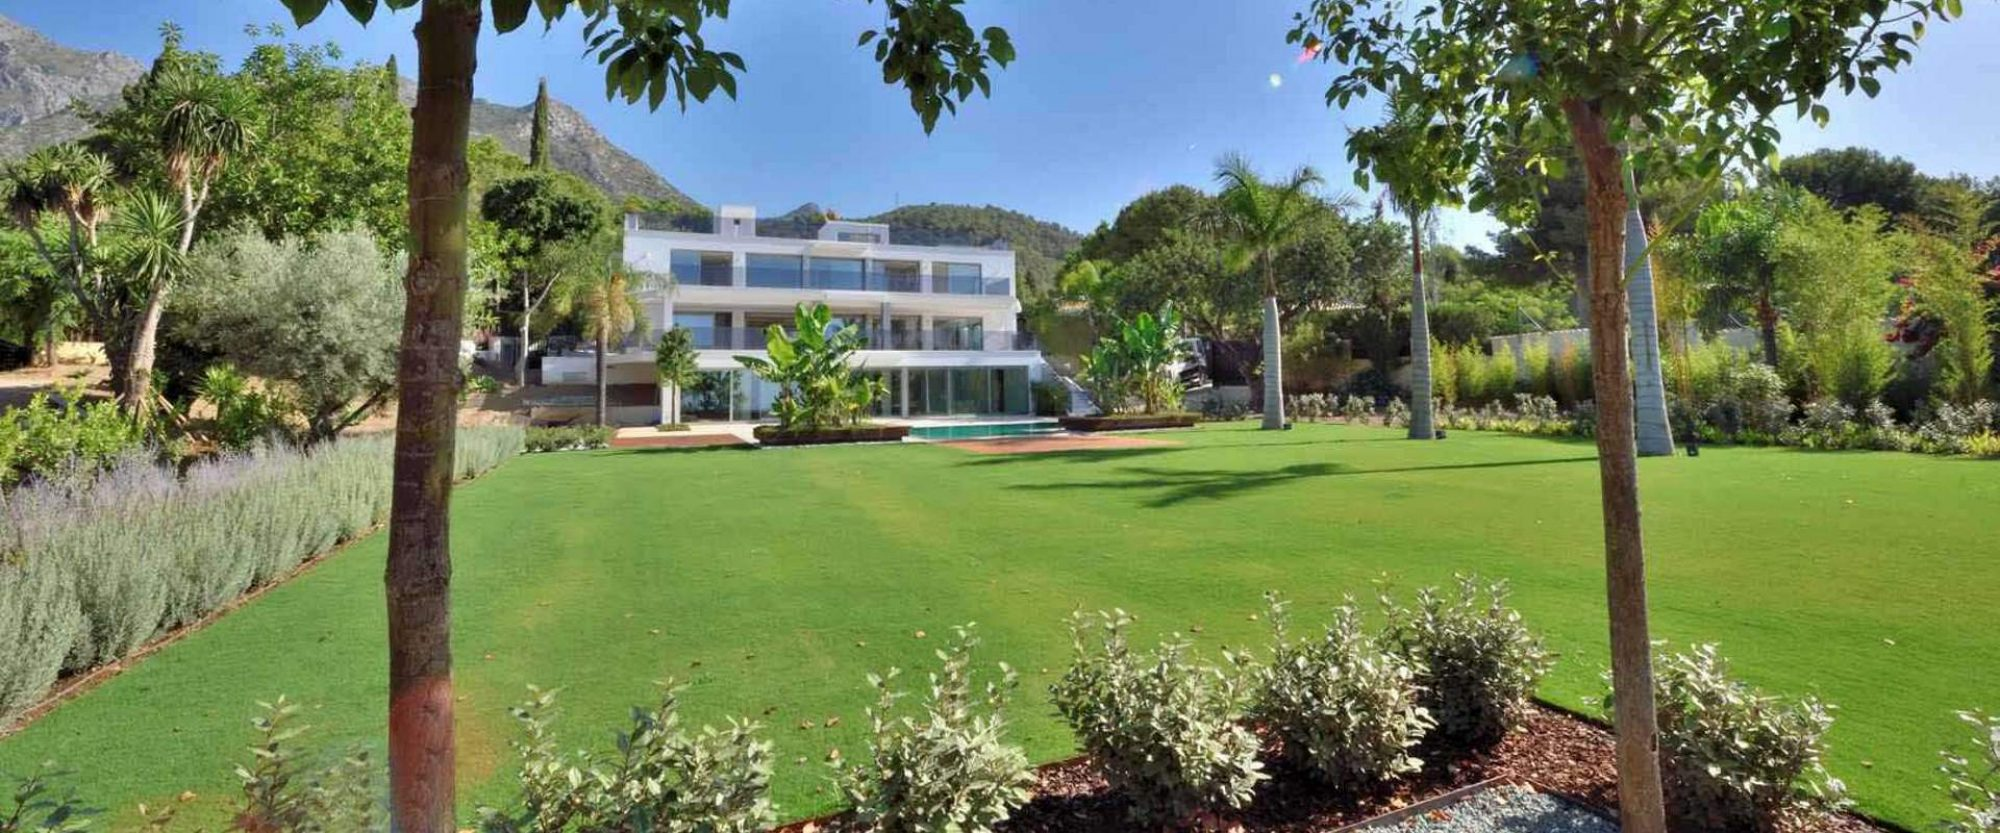 marbella contemporary villa for sale on large plot